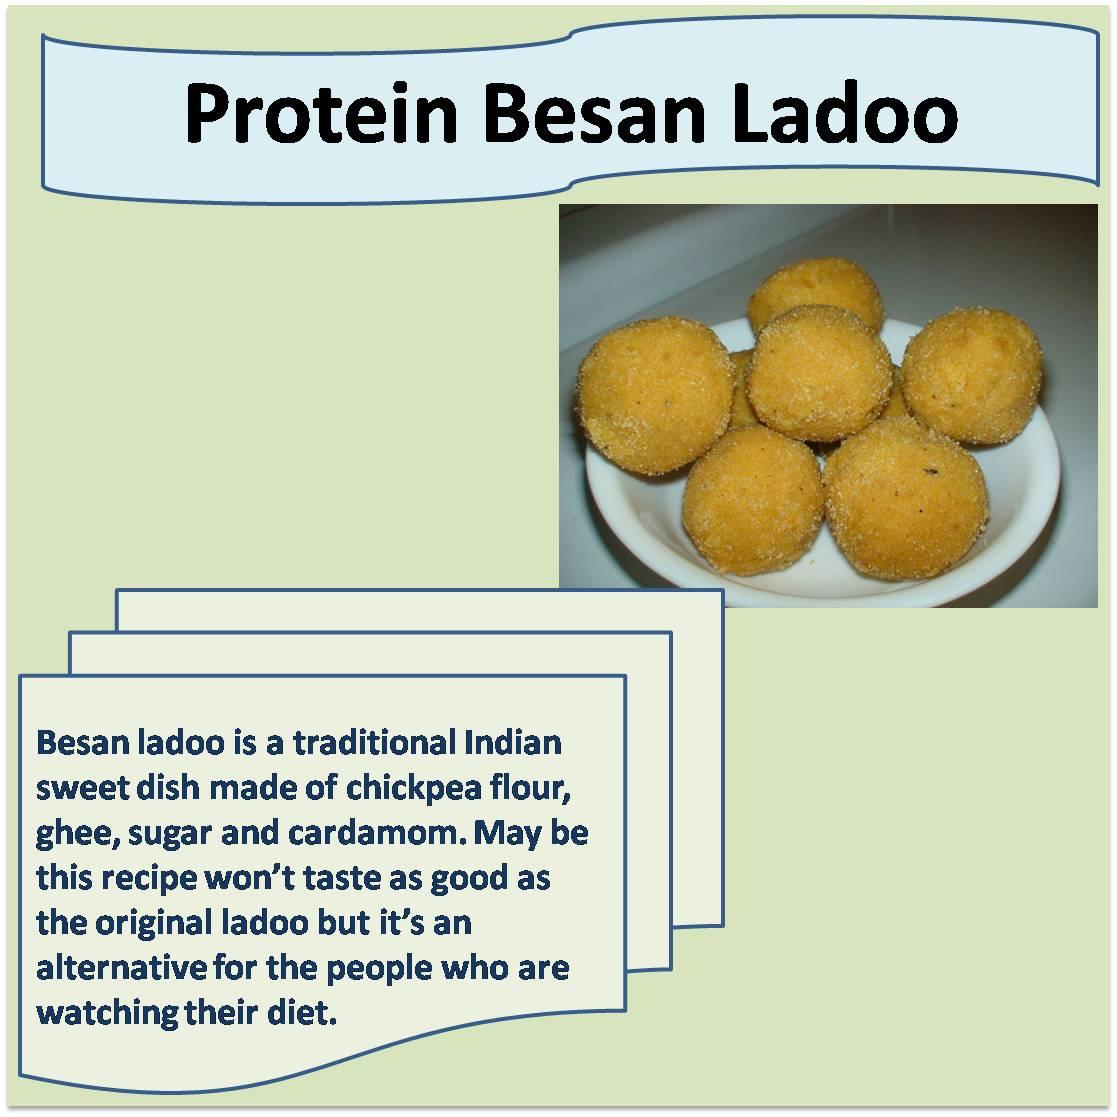 Protein Besan Ladoo